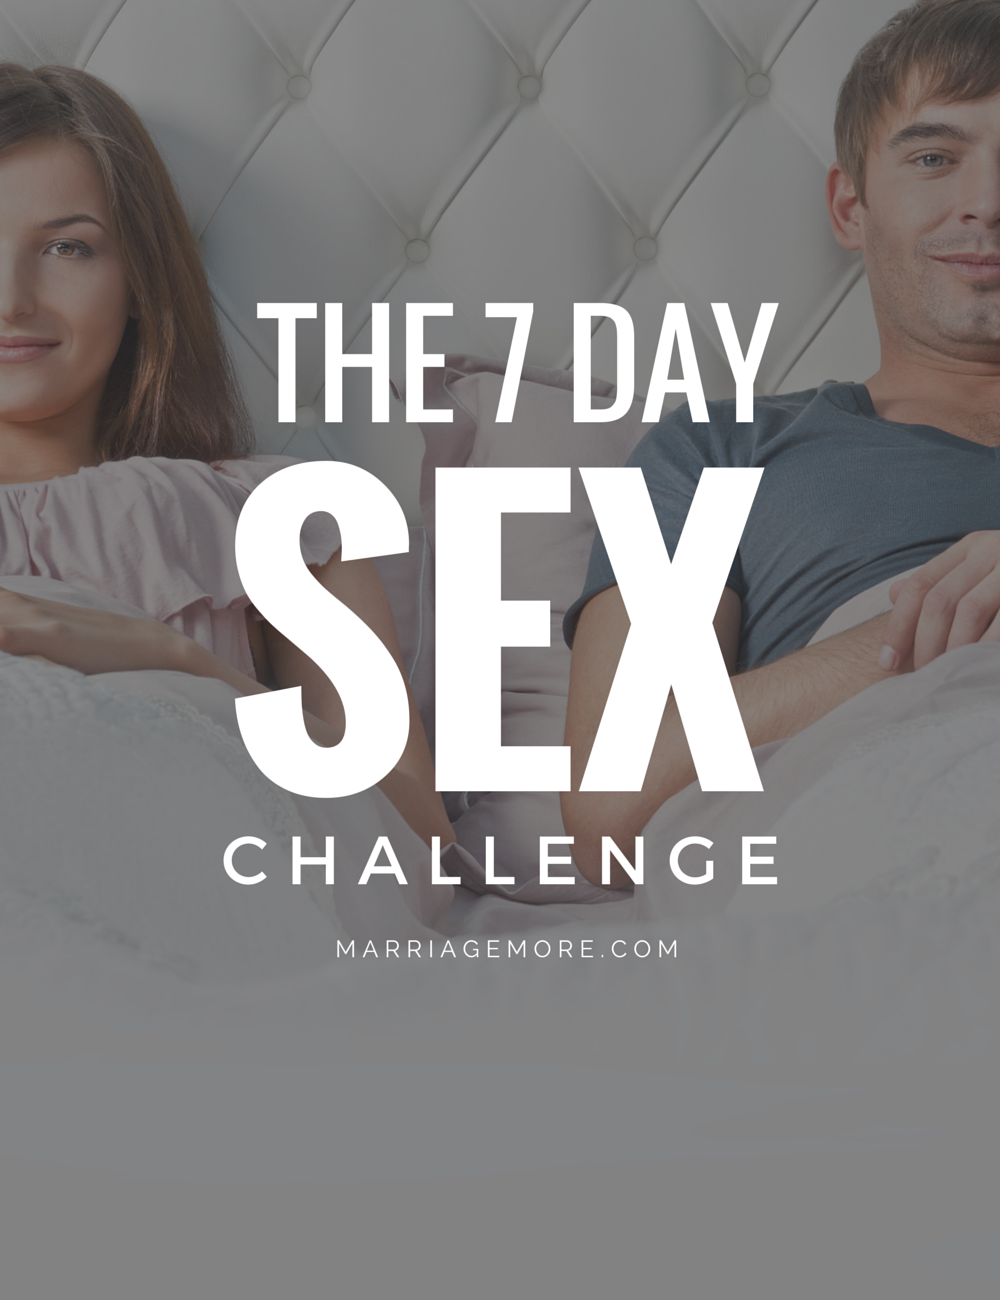 7 days of sex video